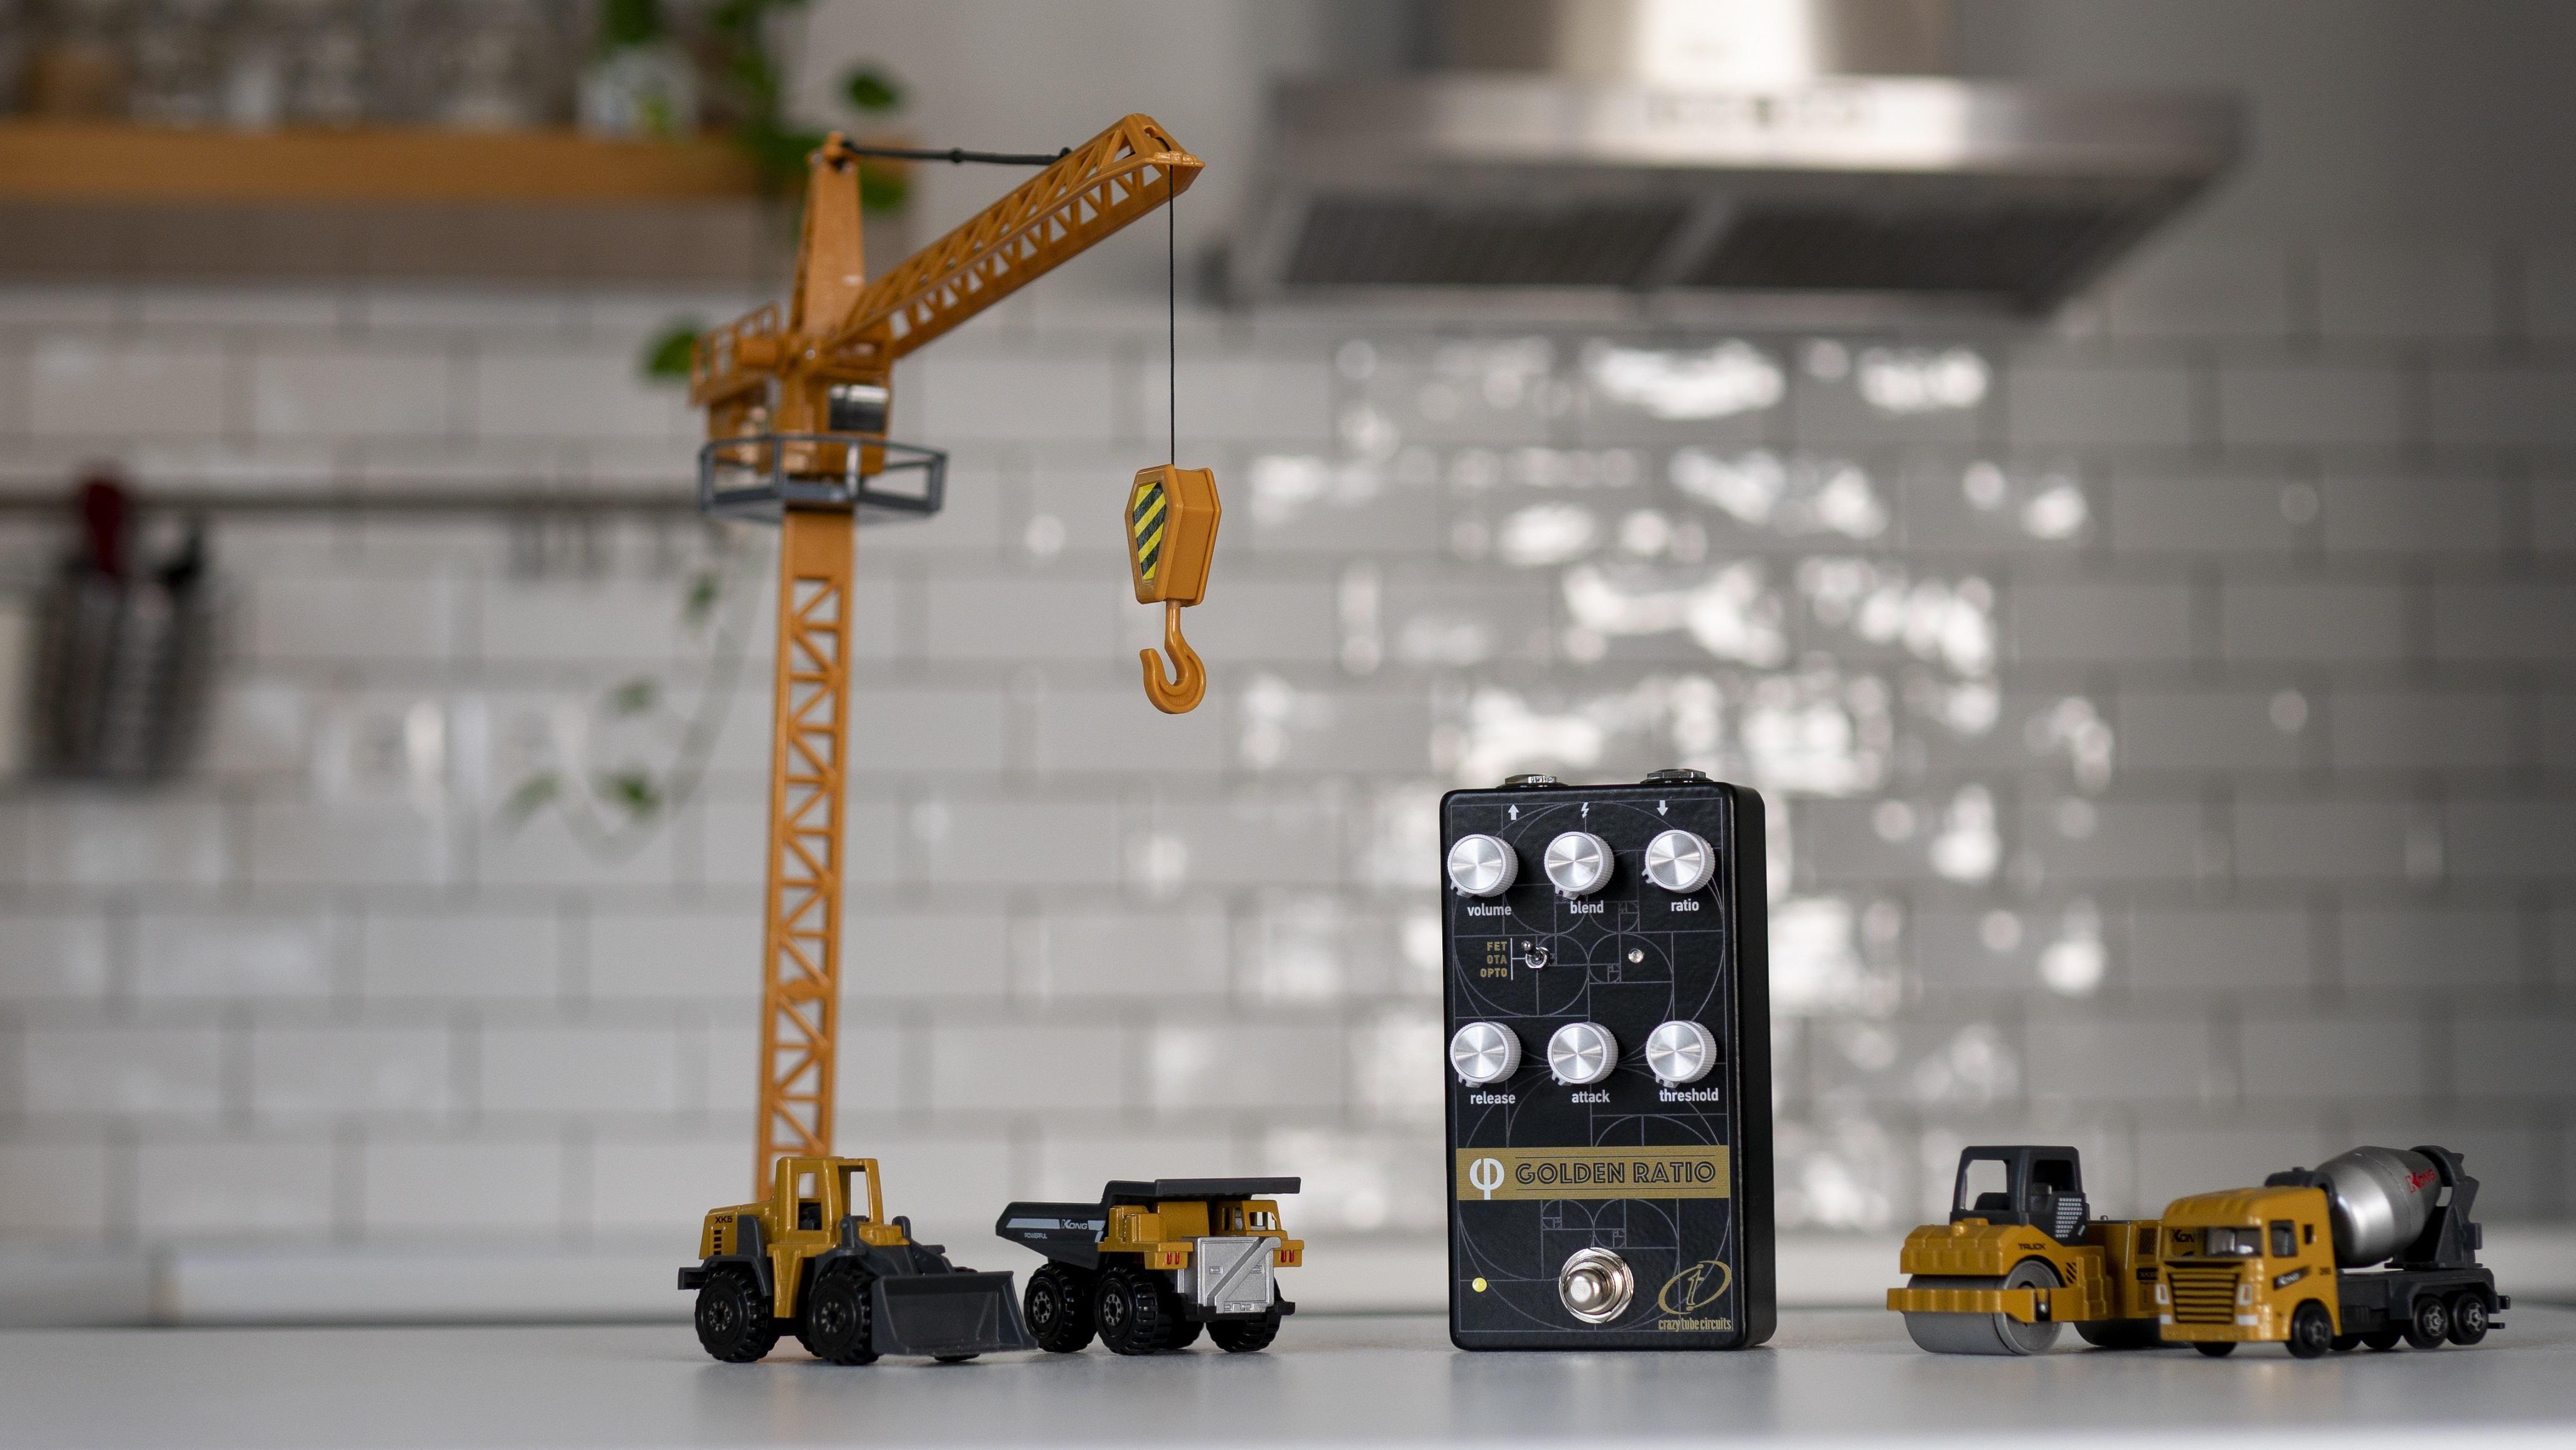 Crazy Tube Circuits Introduces the Golden Ratio Compressor V2